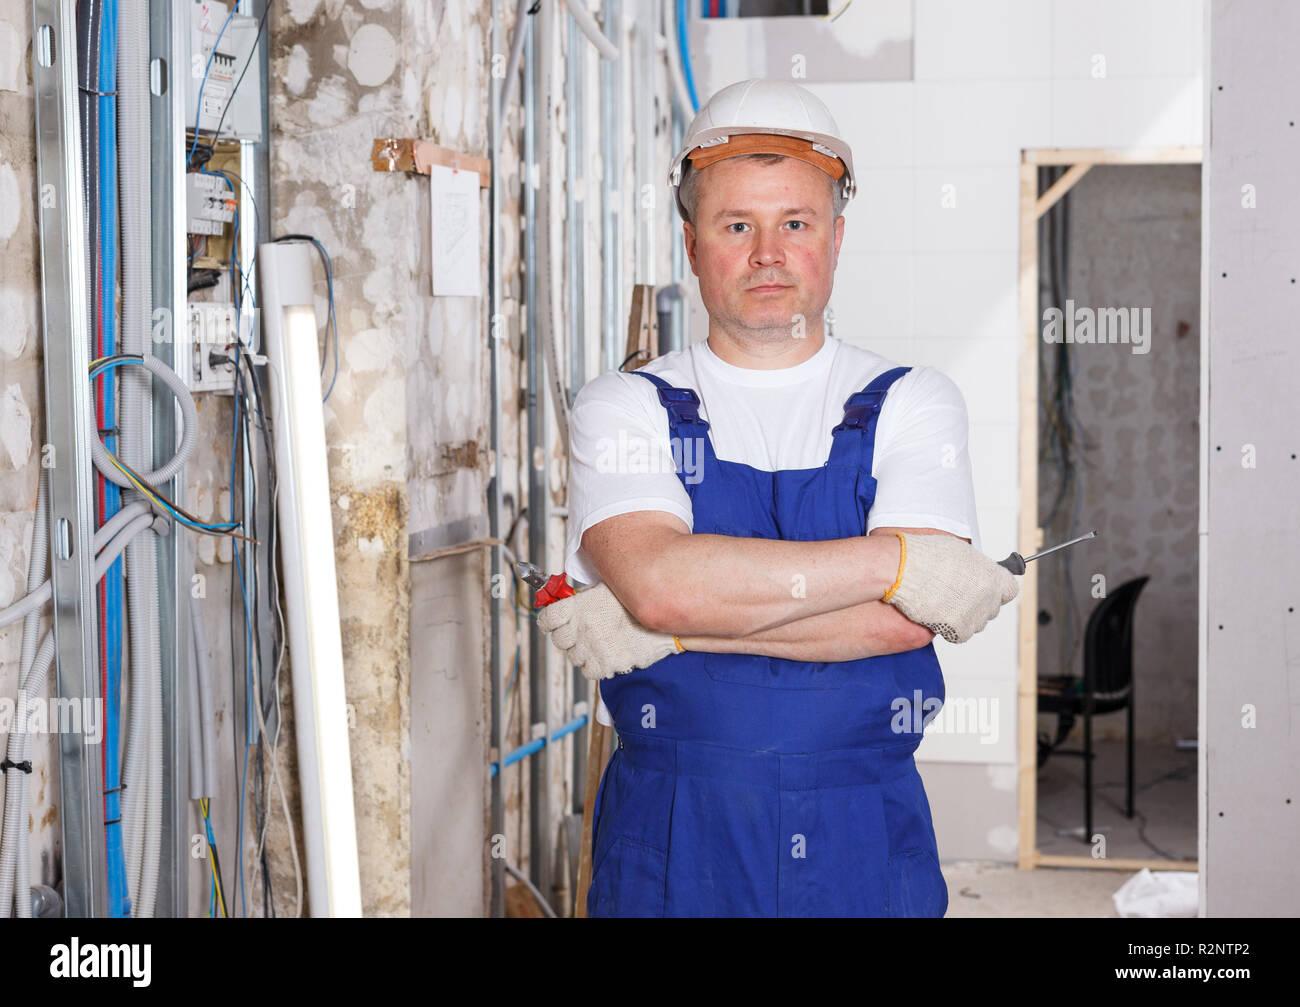 Portrait of confident professional builder posing in repairable room Stock Photo